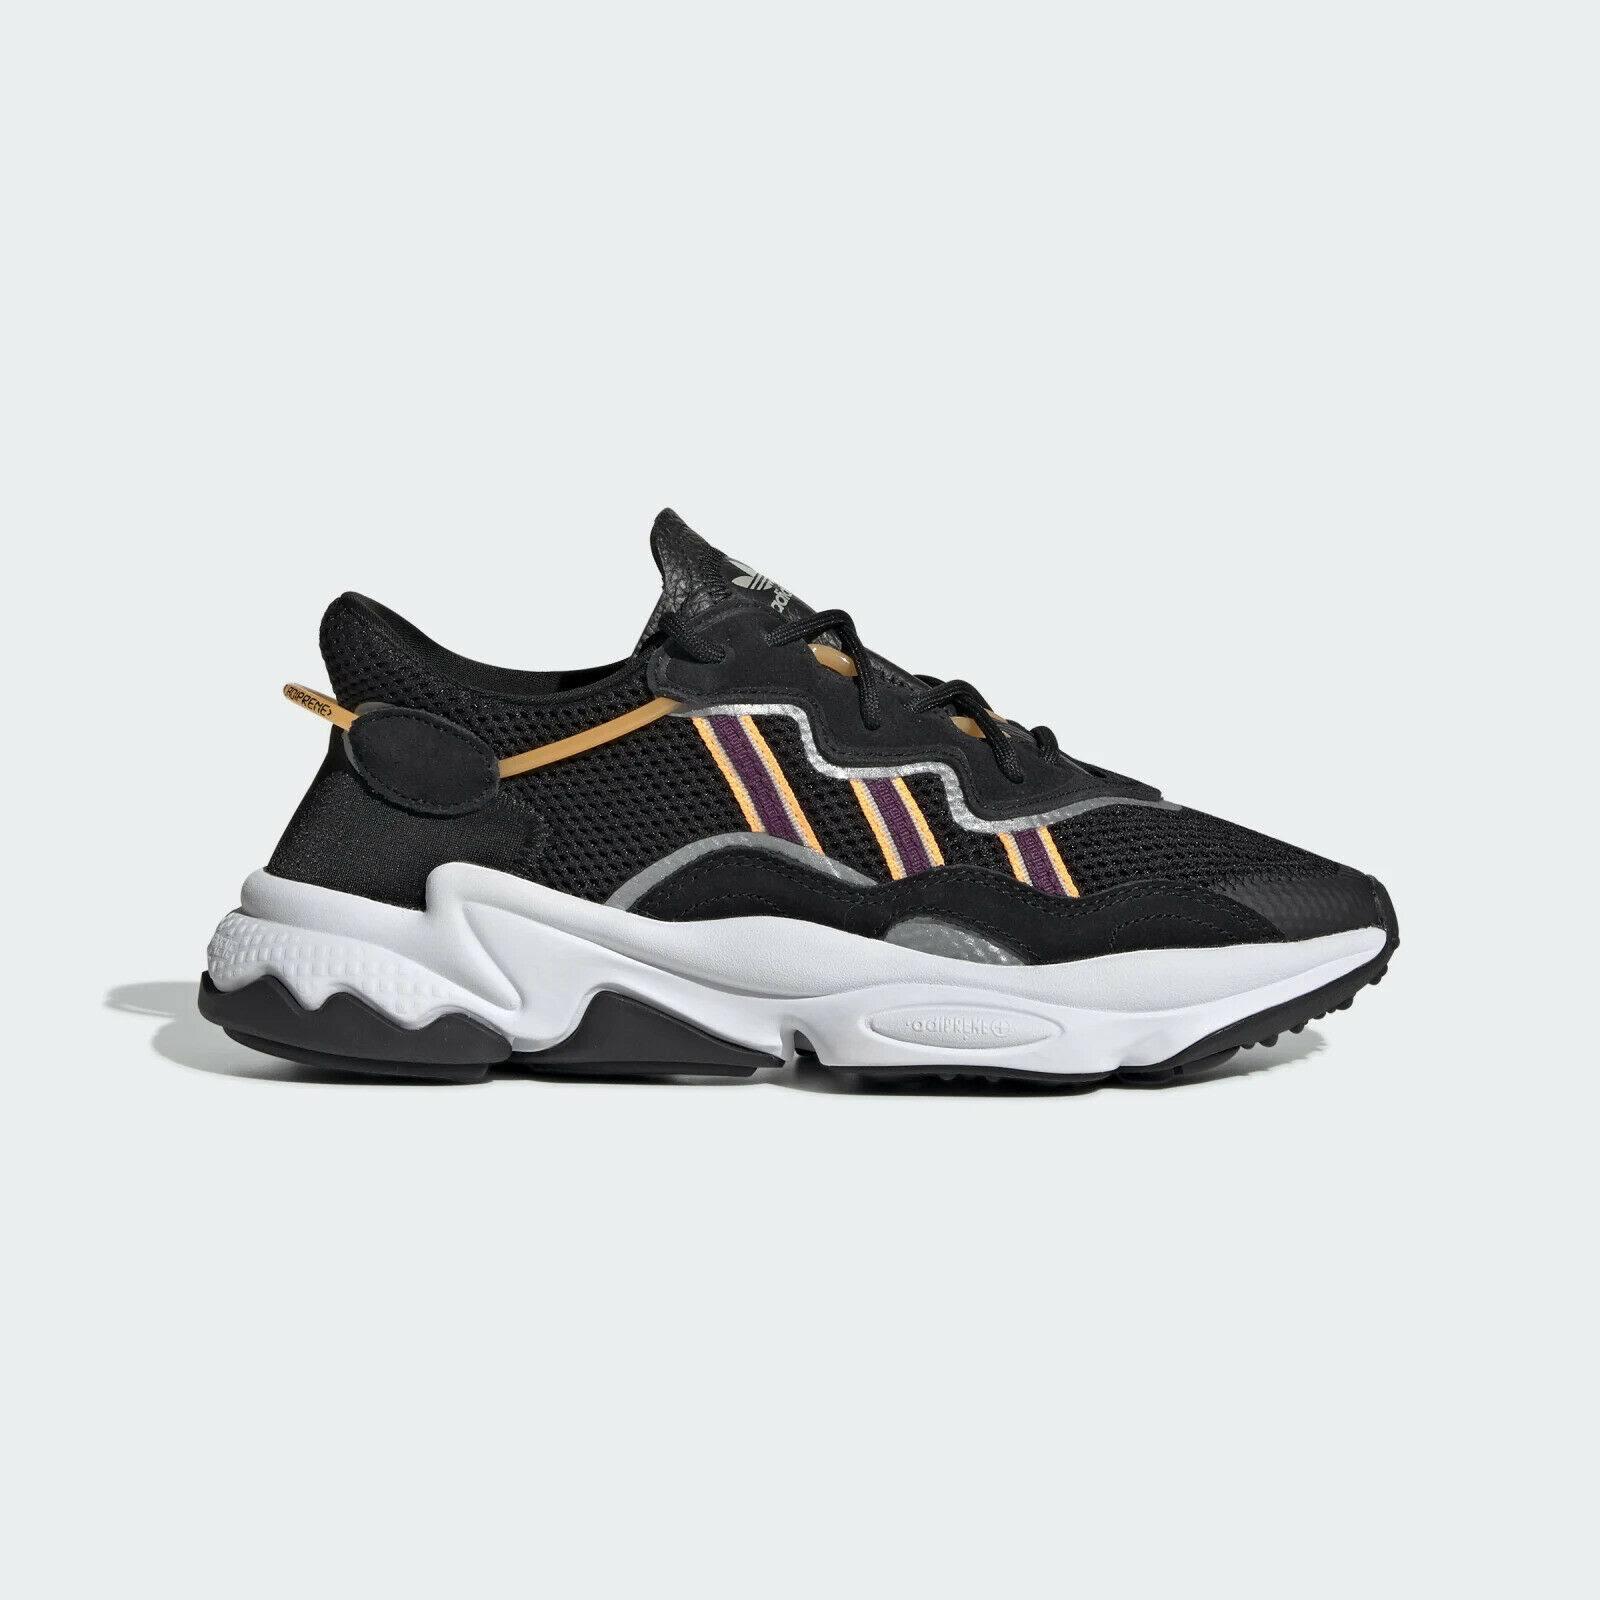 Adidas Ozweego Shoes - Womens - Black